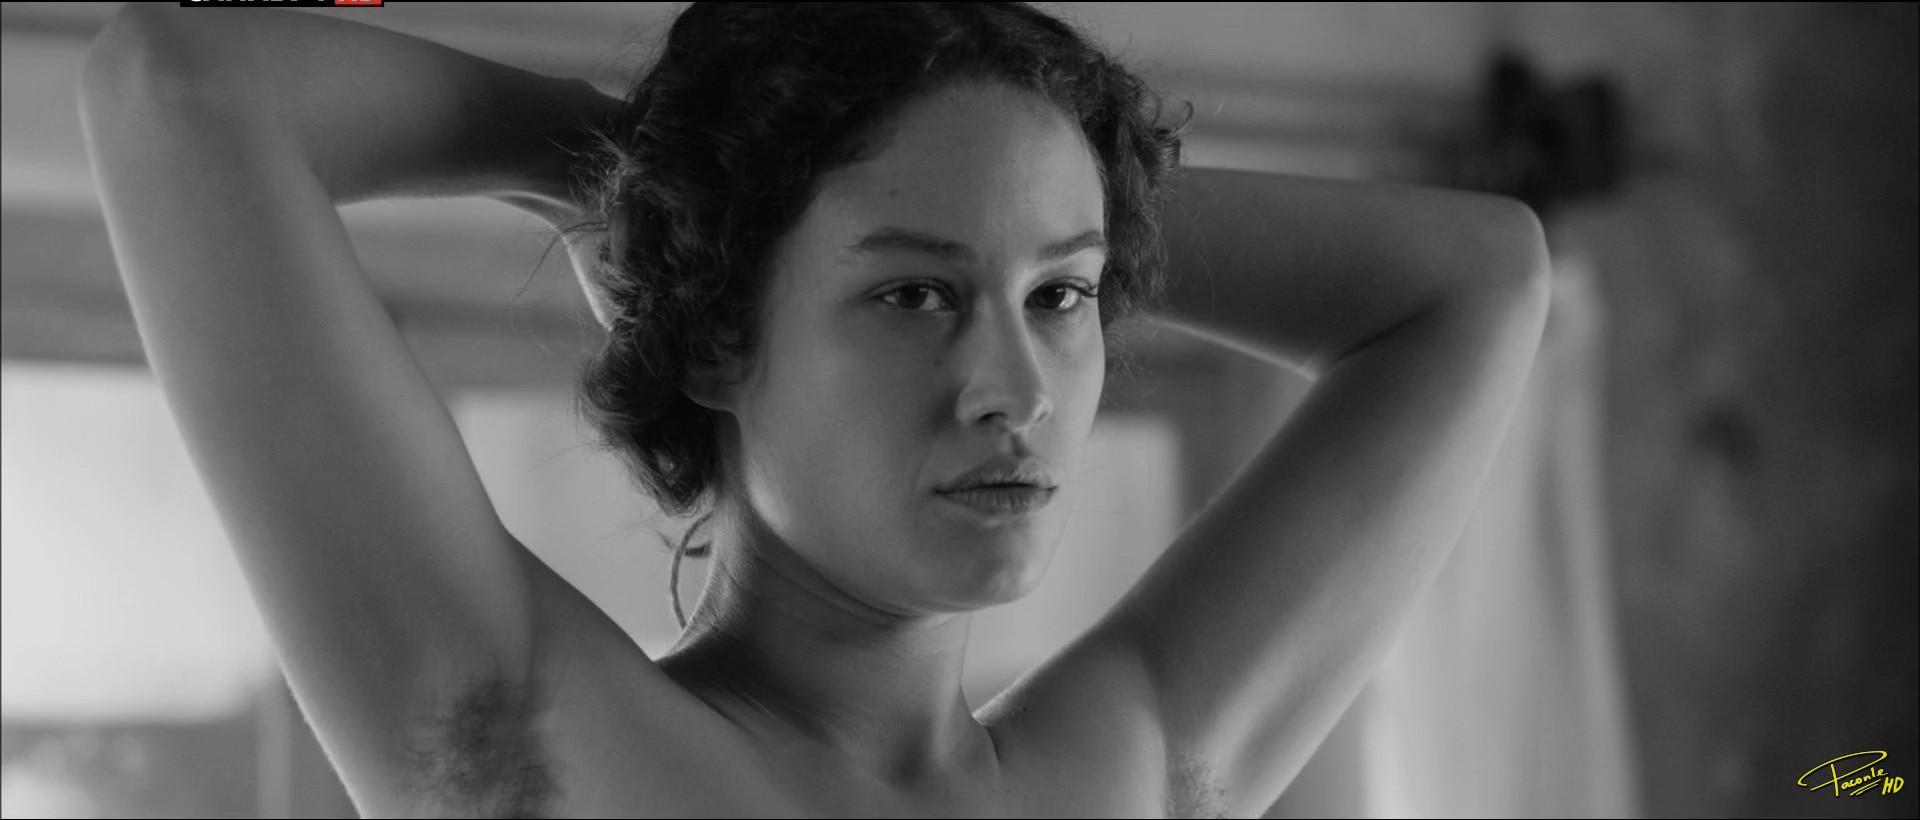 image Aida folch nude fin de curso Part 8